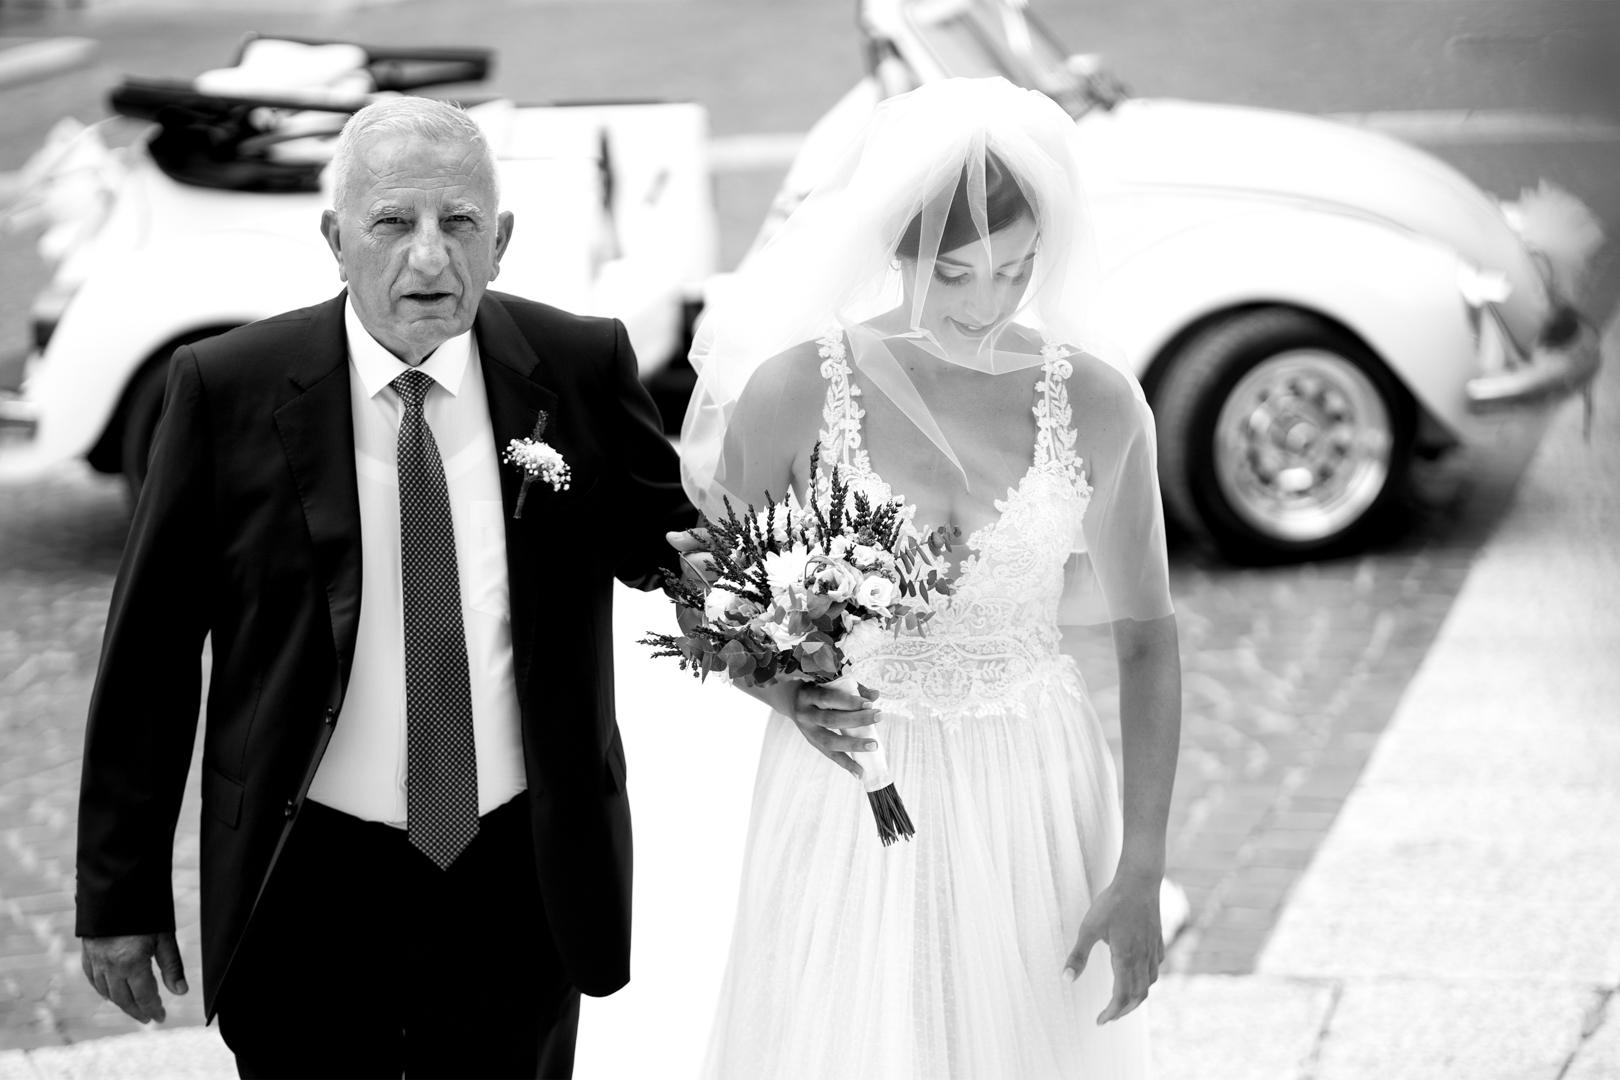 26 gianni-lepore-papà sposo-chiesa-entrata